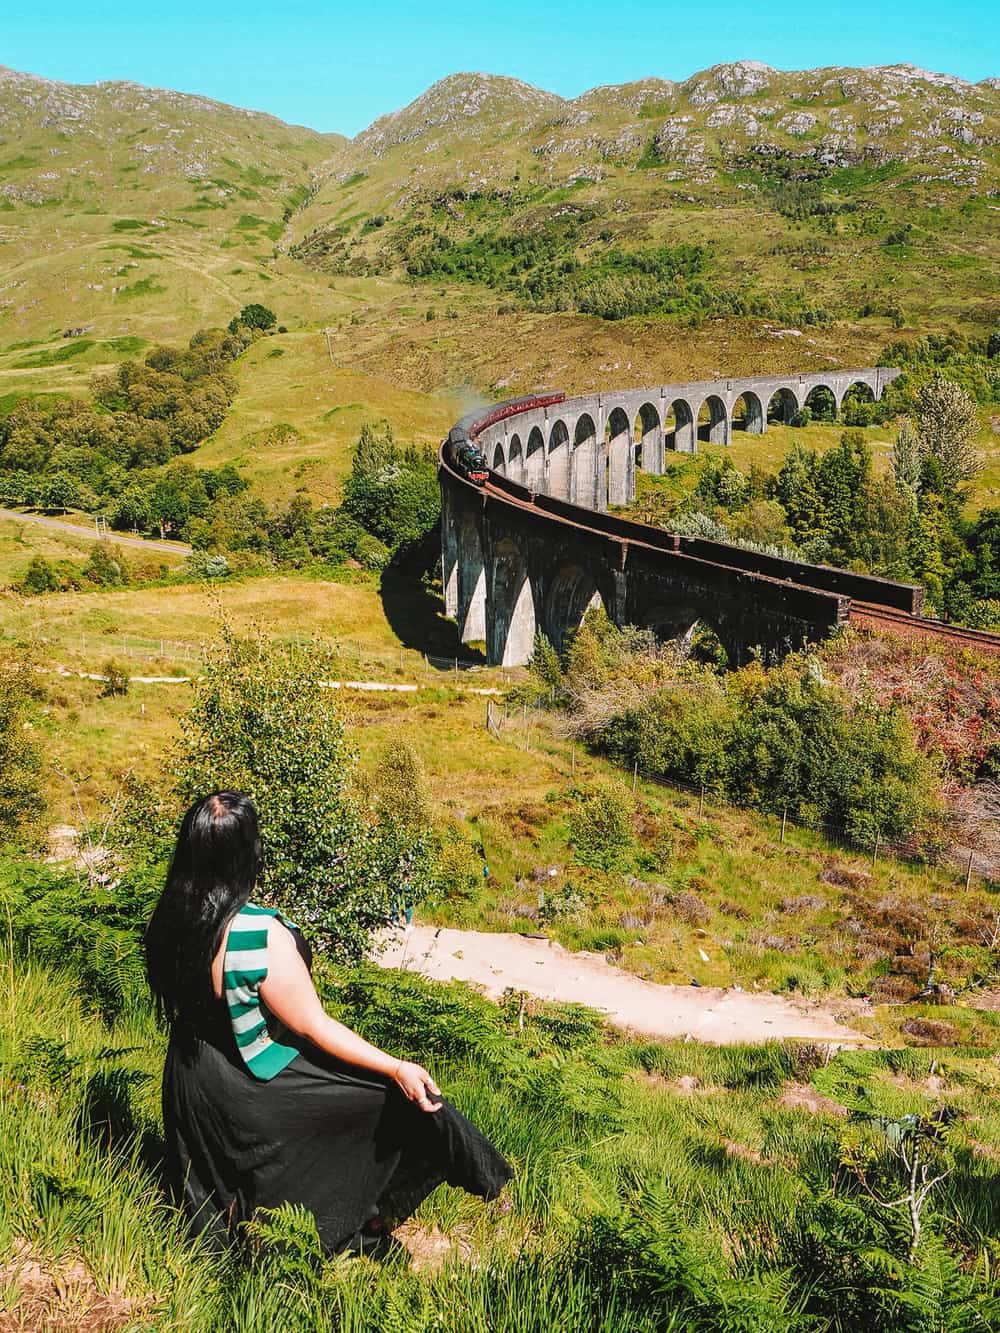 Hogwarts Express at Glenfinnan Viaduct Viewpoint